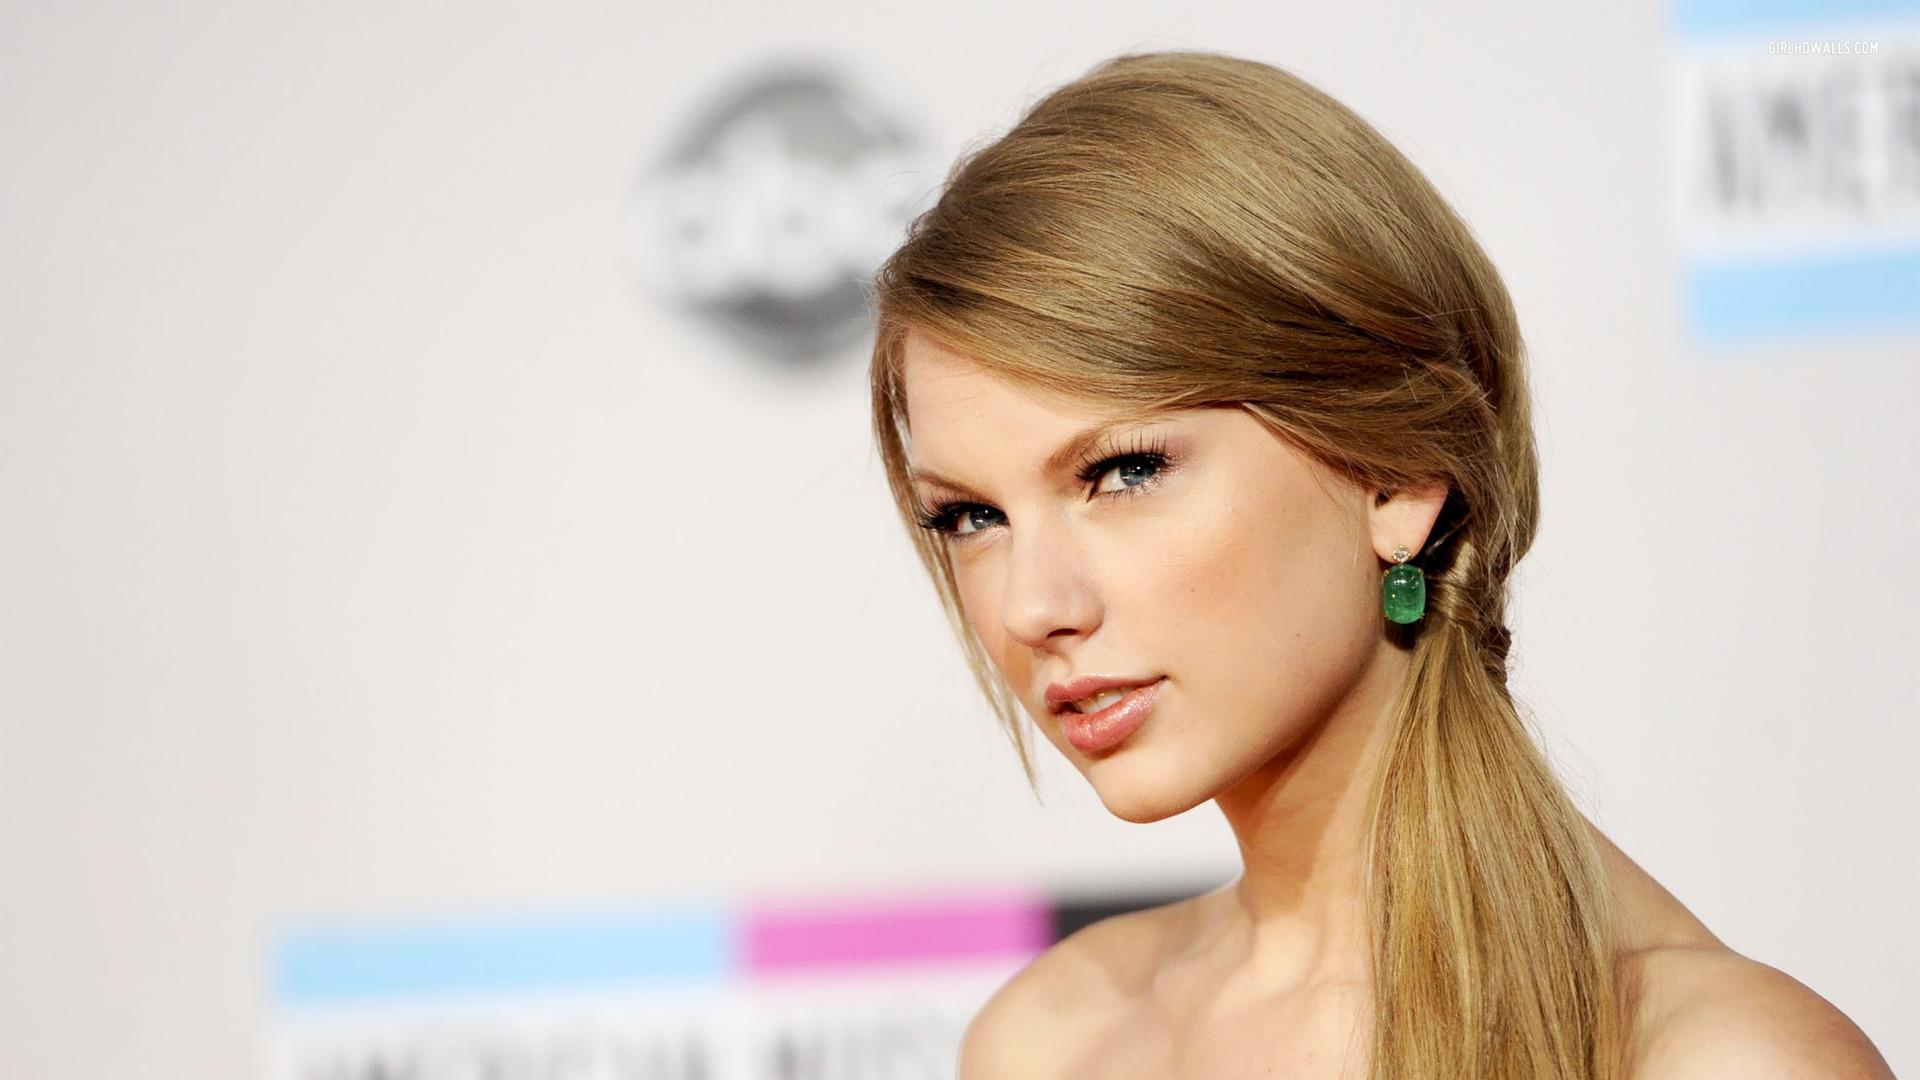 Beautiful Taylor Swift Wallpapers WeNeedFun 1920x1080